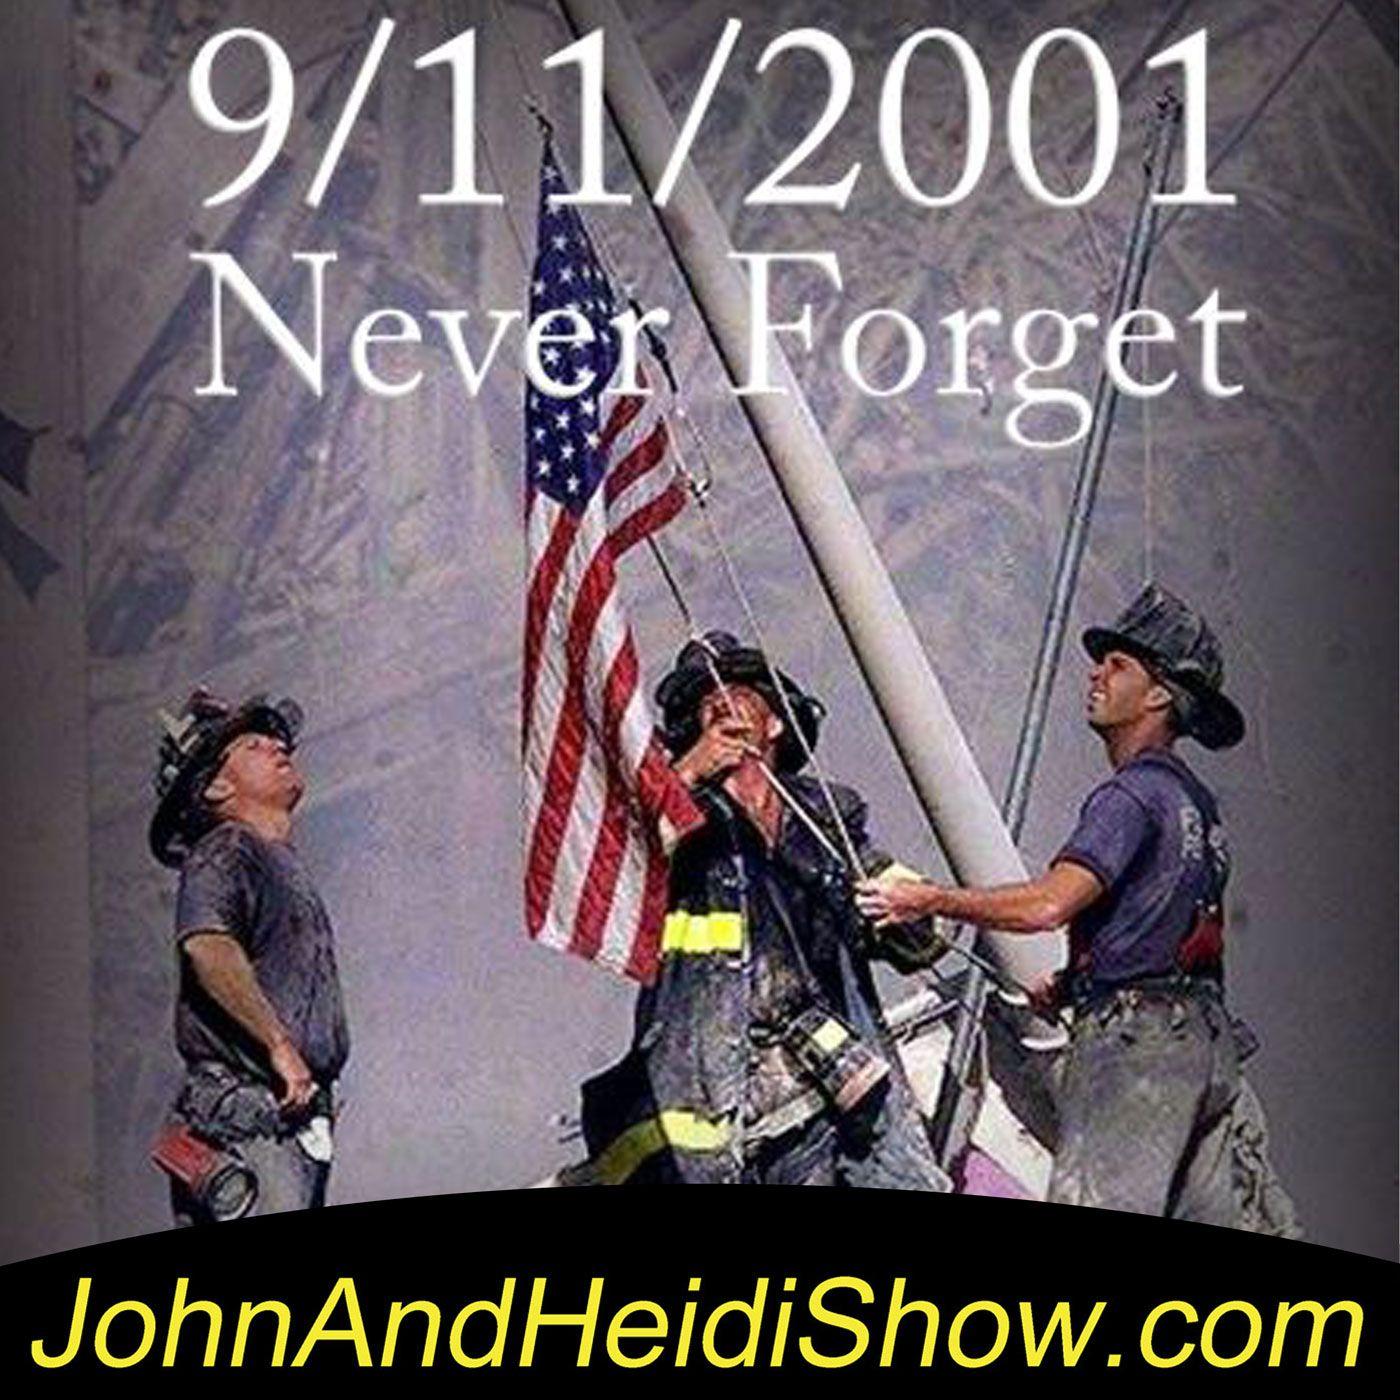 09-11-20-John And Heidi Show-911Tribute